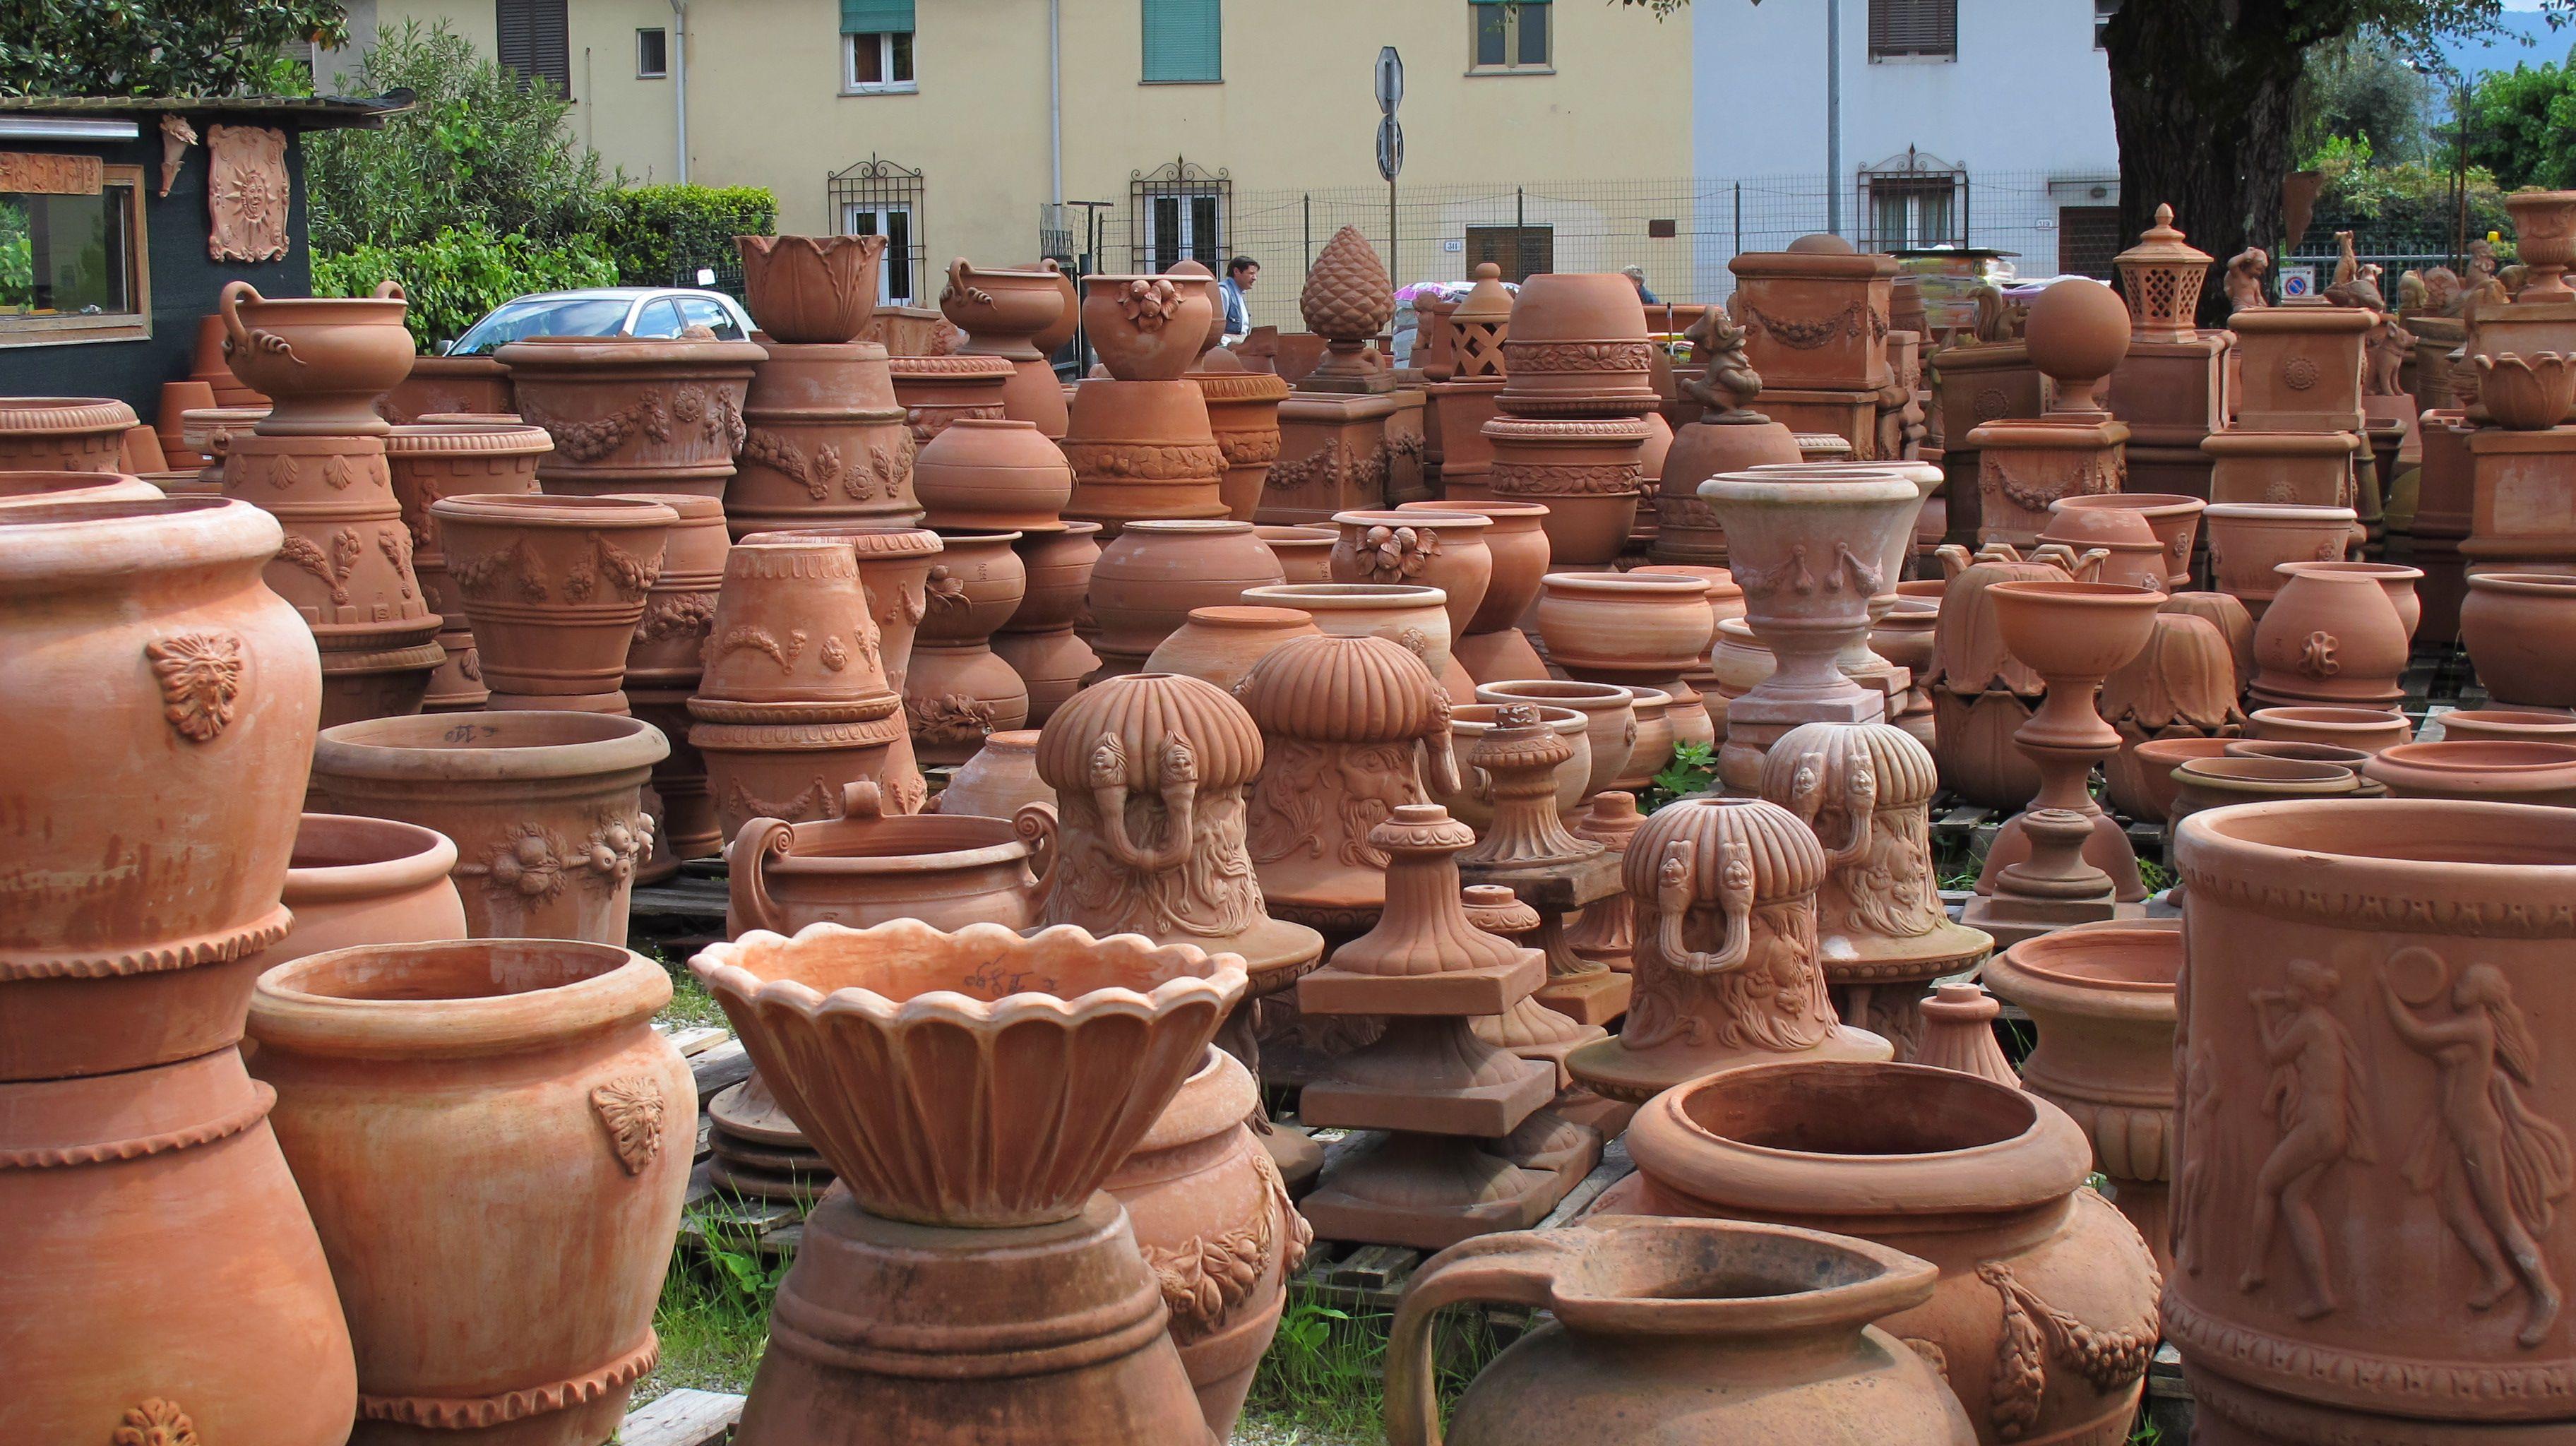 Lots Of Terracotta Pots Terra Cotta Pinterest Terracotta Pots Tulip And Middle